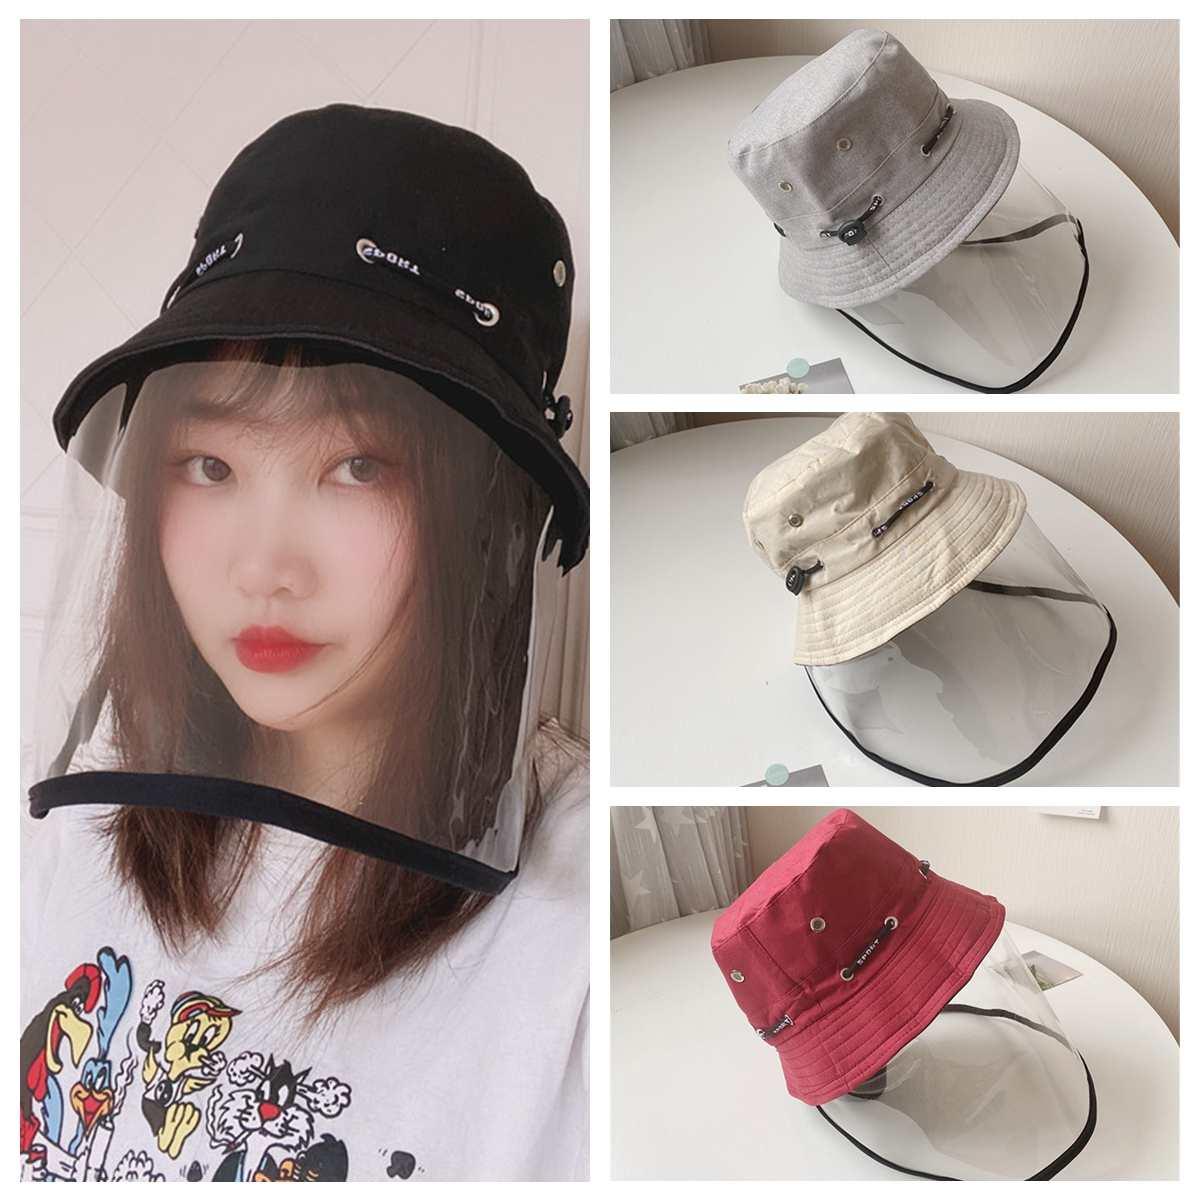 Transparent Anti Virus Protective Mask Anti-spitting Anti-droplet Splash-Proof Hat Fisherman Cap